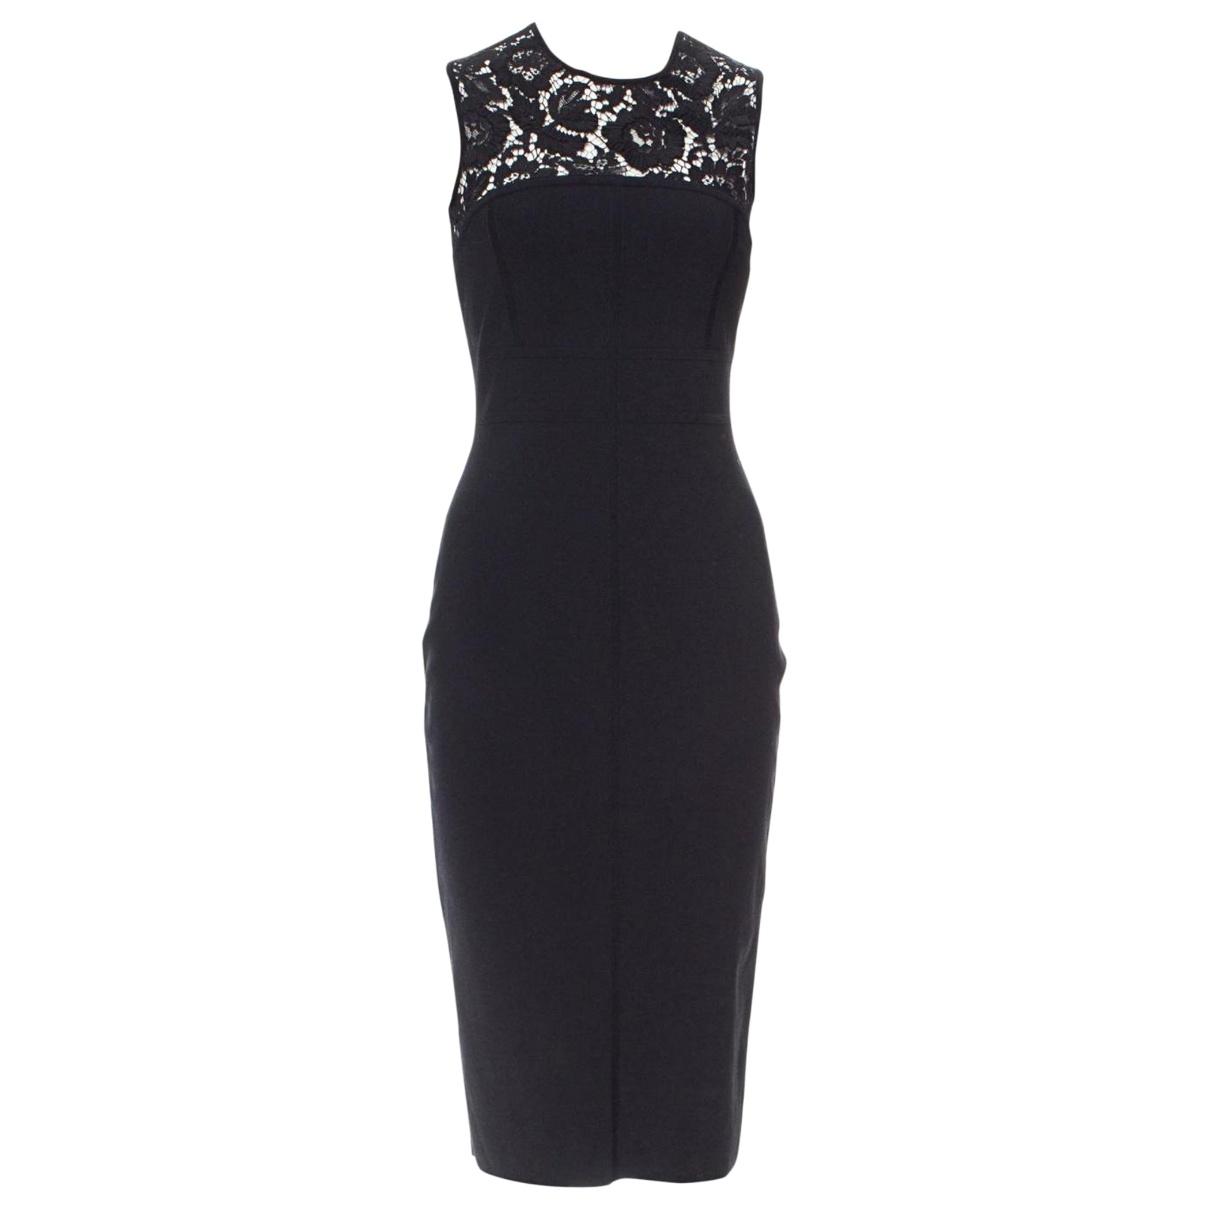 Valentino Garavani \N Black dress for Women S International